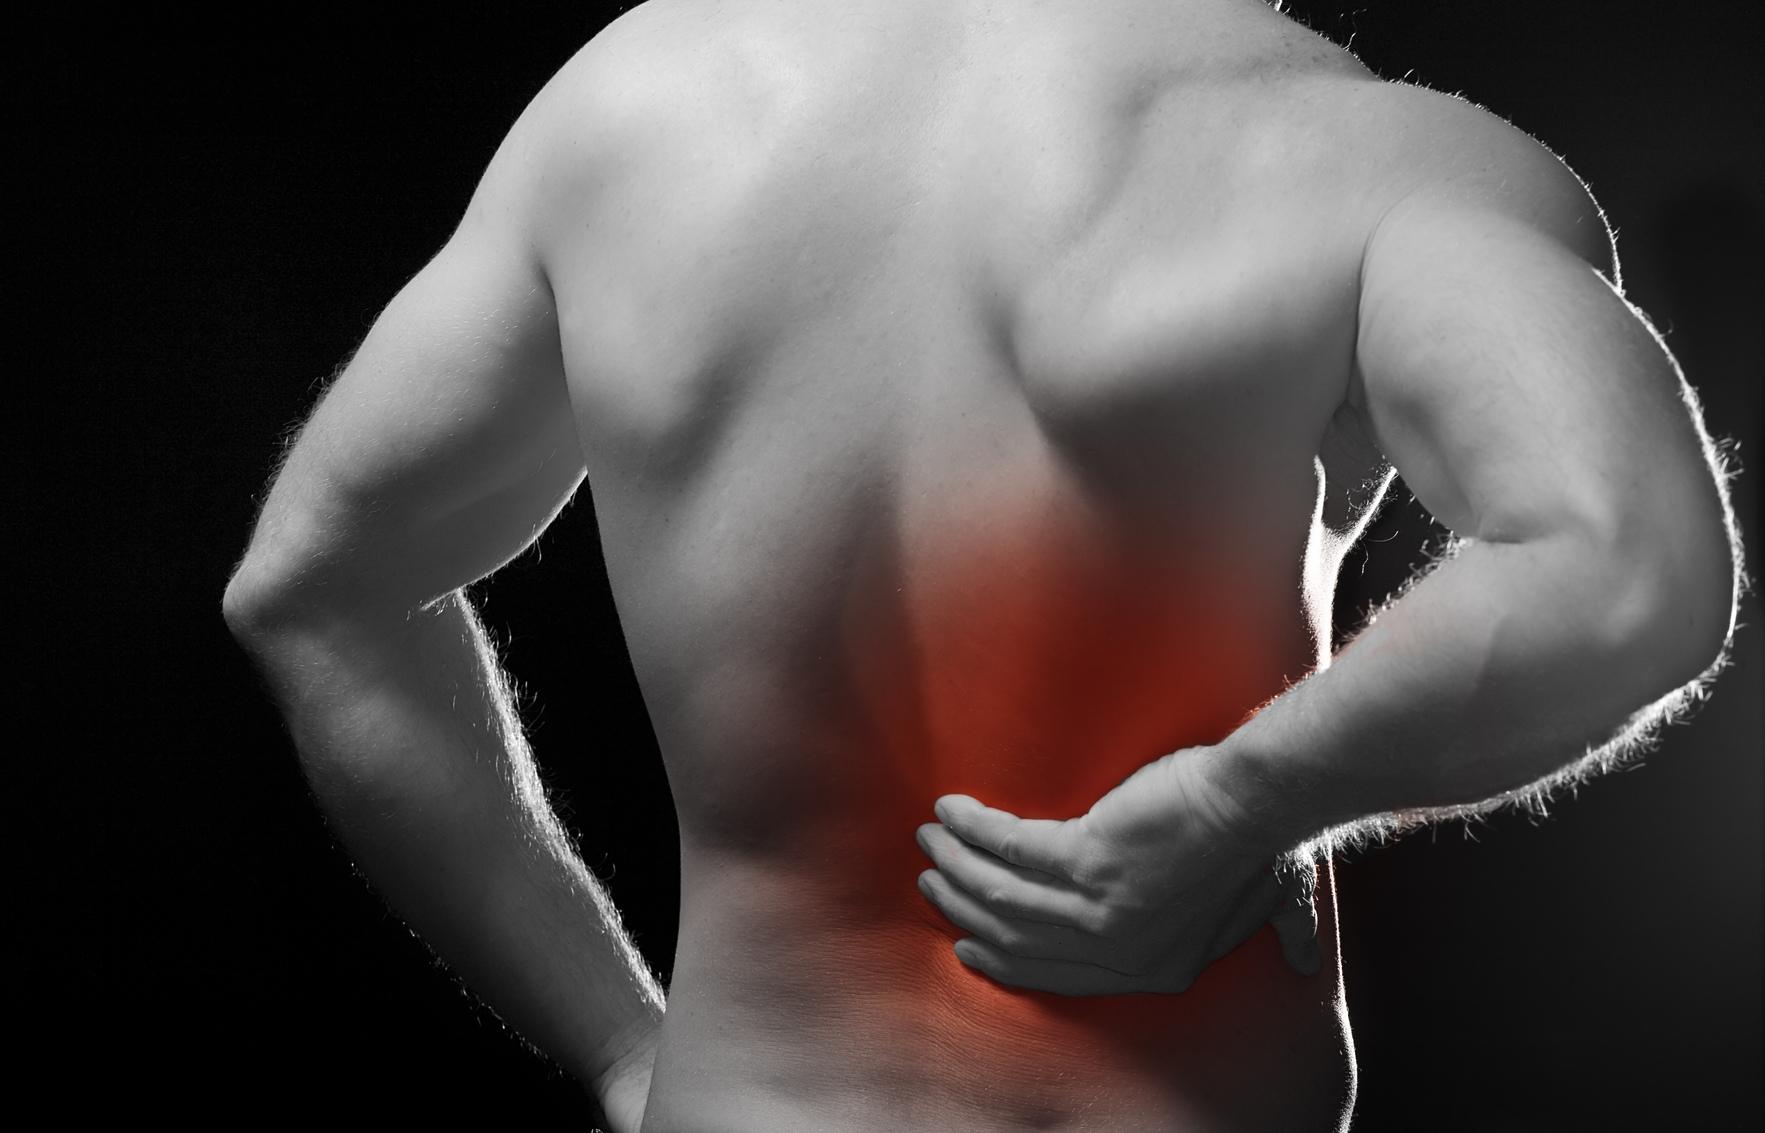 Lower body pain